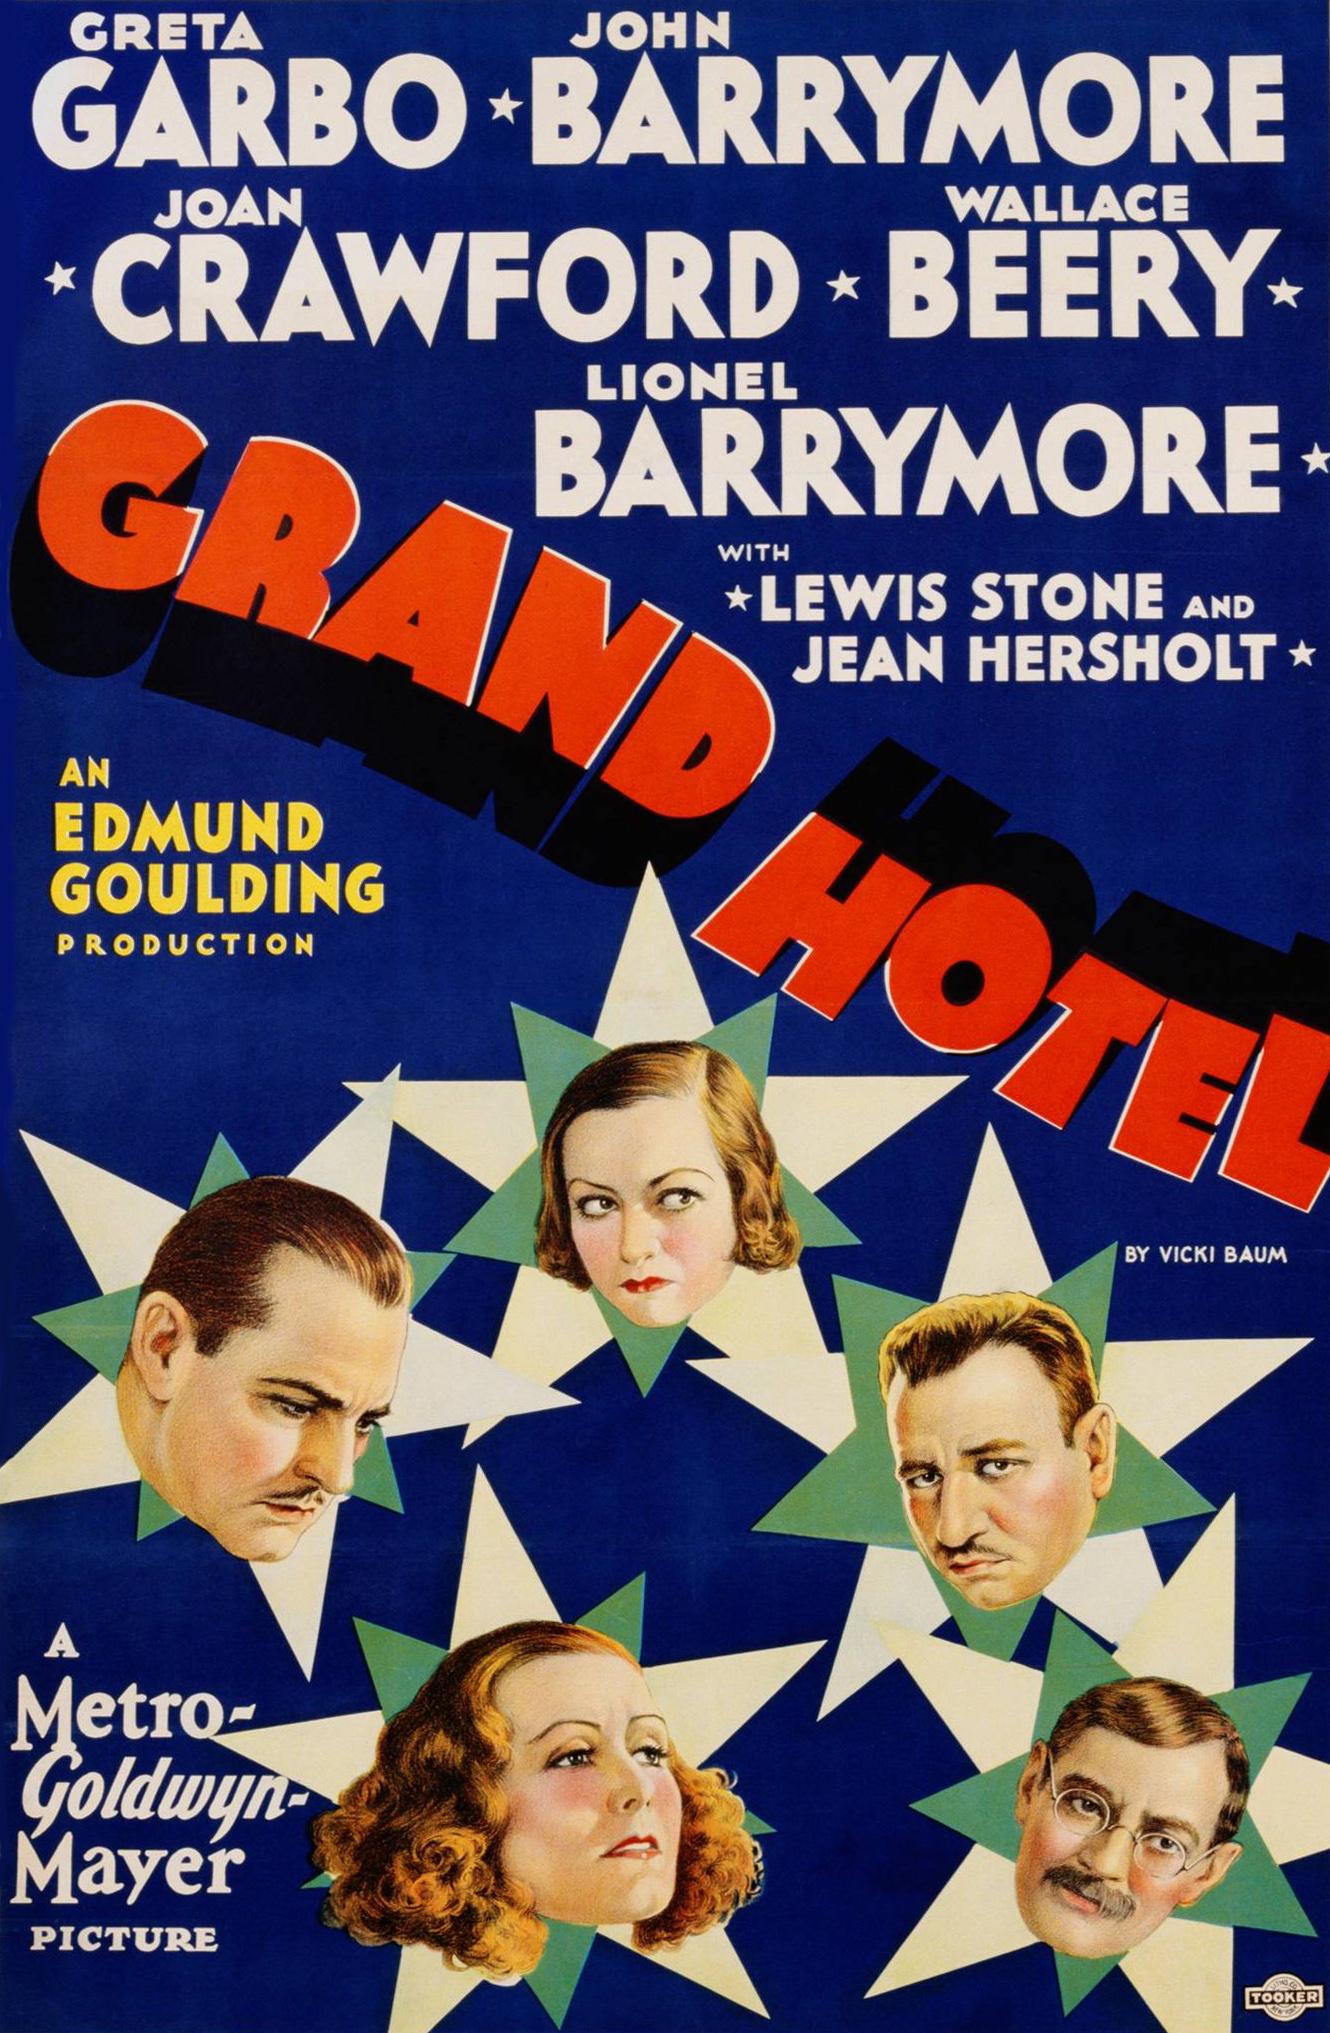 Grand hotel film 2019 online dating